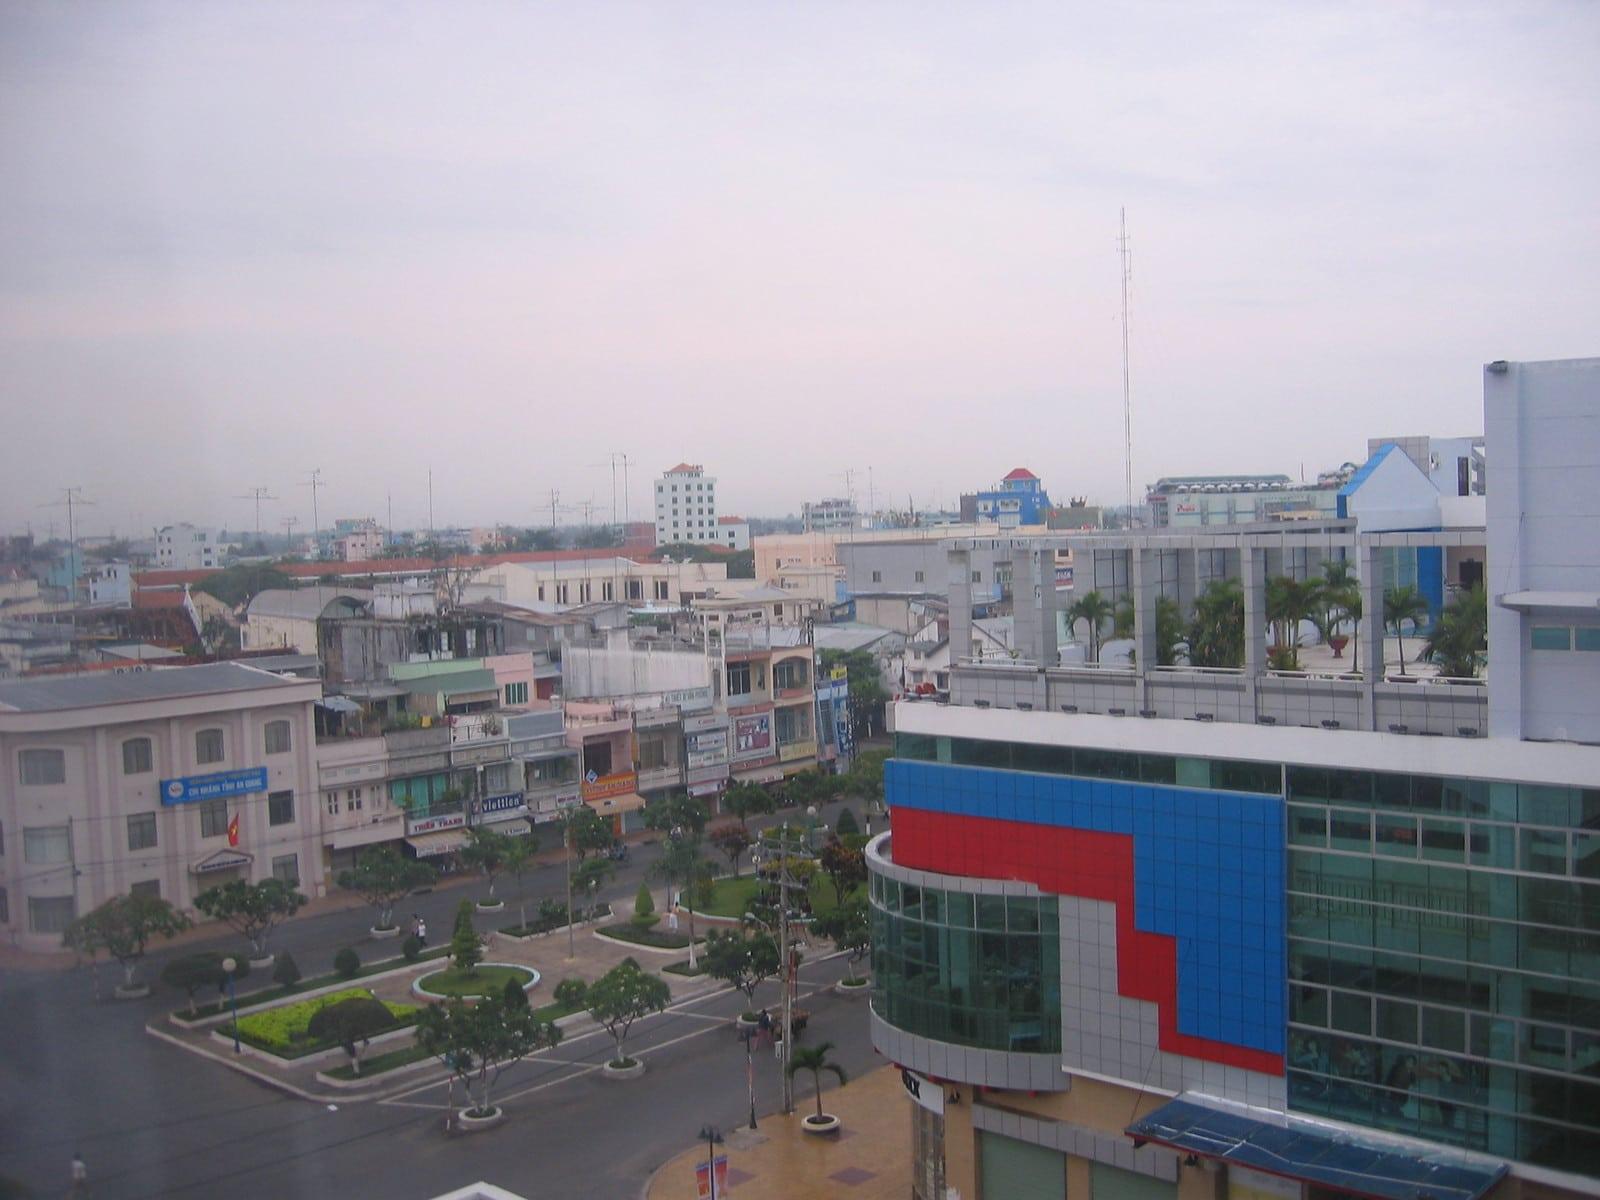 City View of Long Xuyen Vietnam